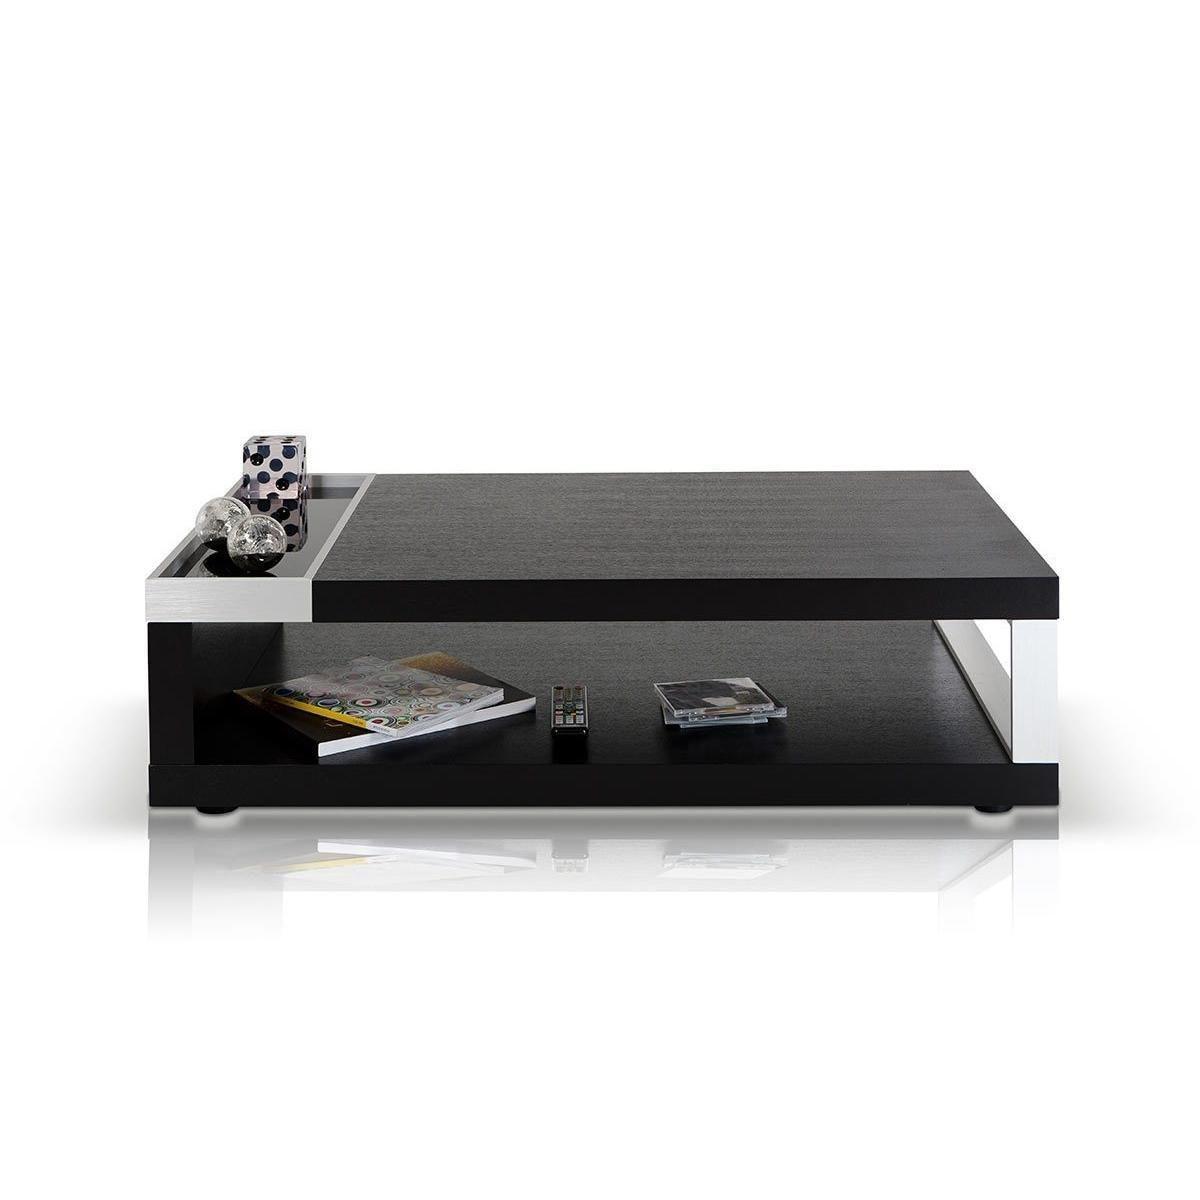 Modrest Lignite Modern Black Oak Coffee Table Solid Coffee Table Coffee Table Coffee Table With Storage [ 800 x 1200 Pixel ]